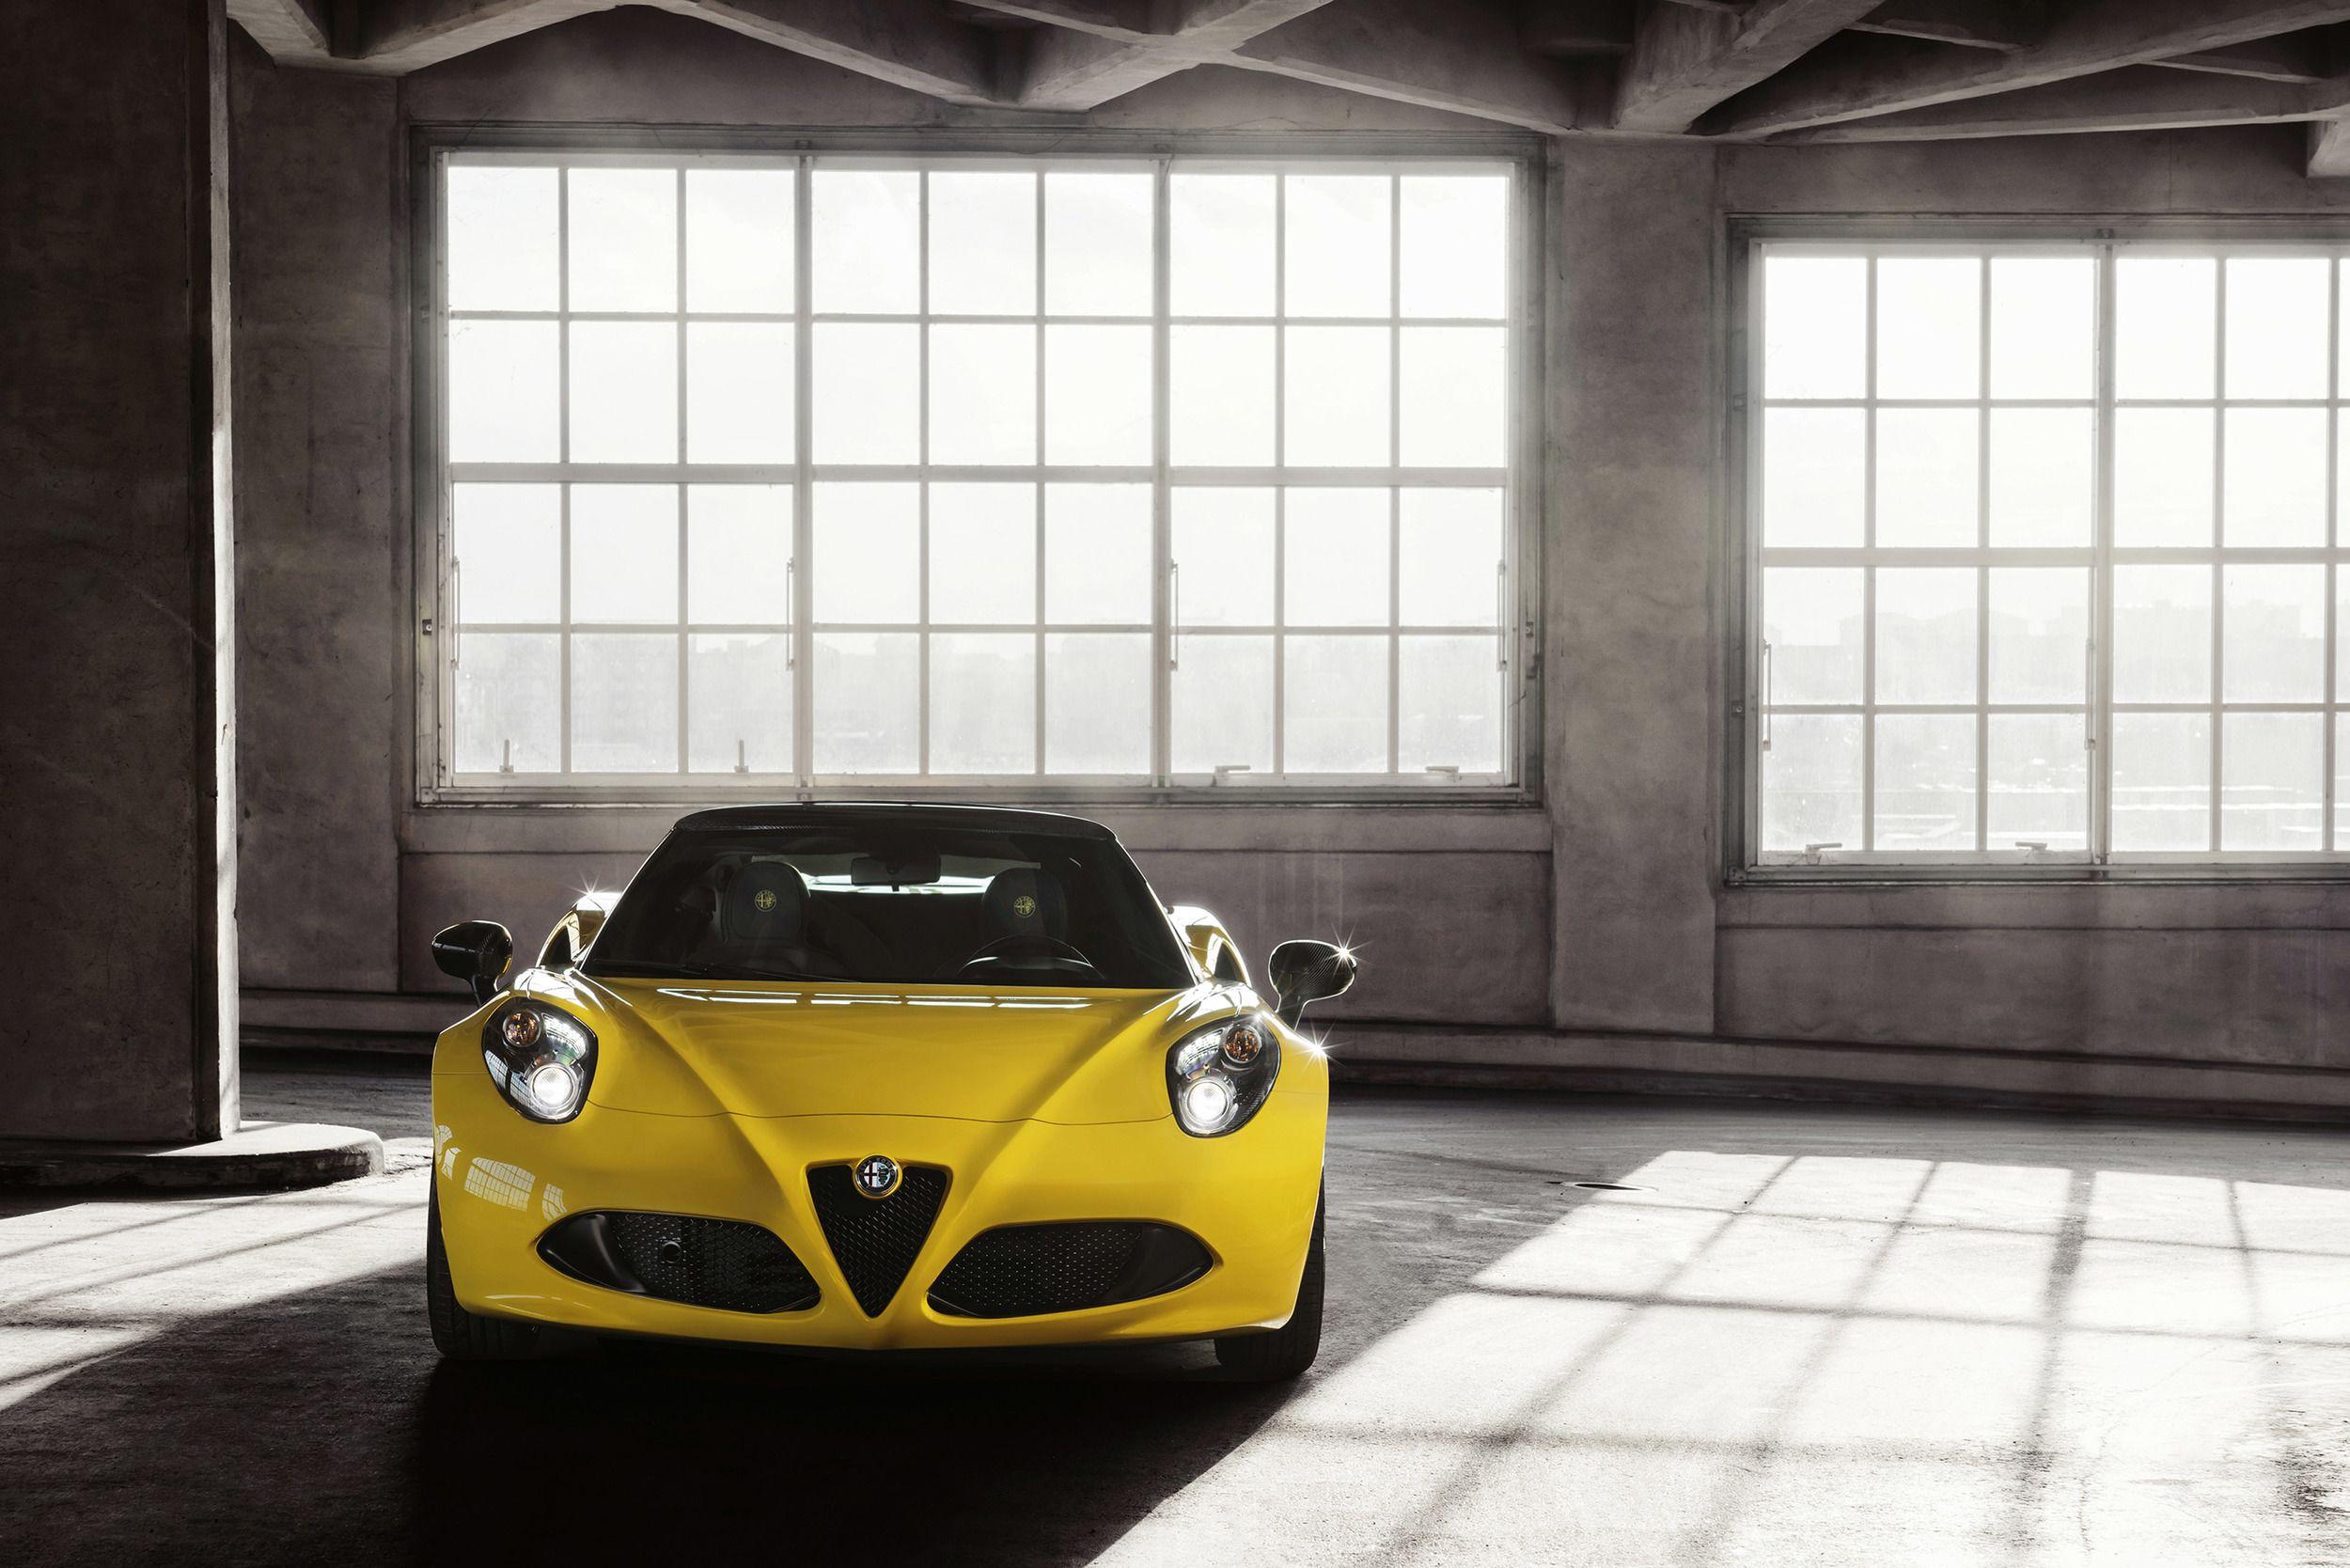 2015 Alfa Romeo 4c Spider Photo Gallery